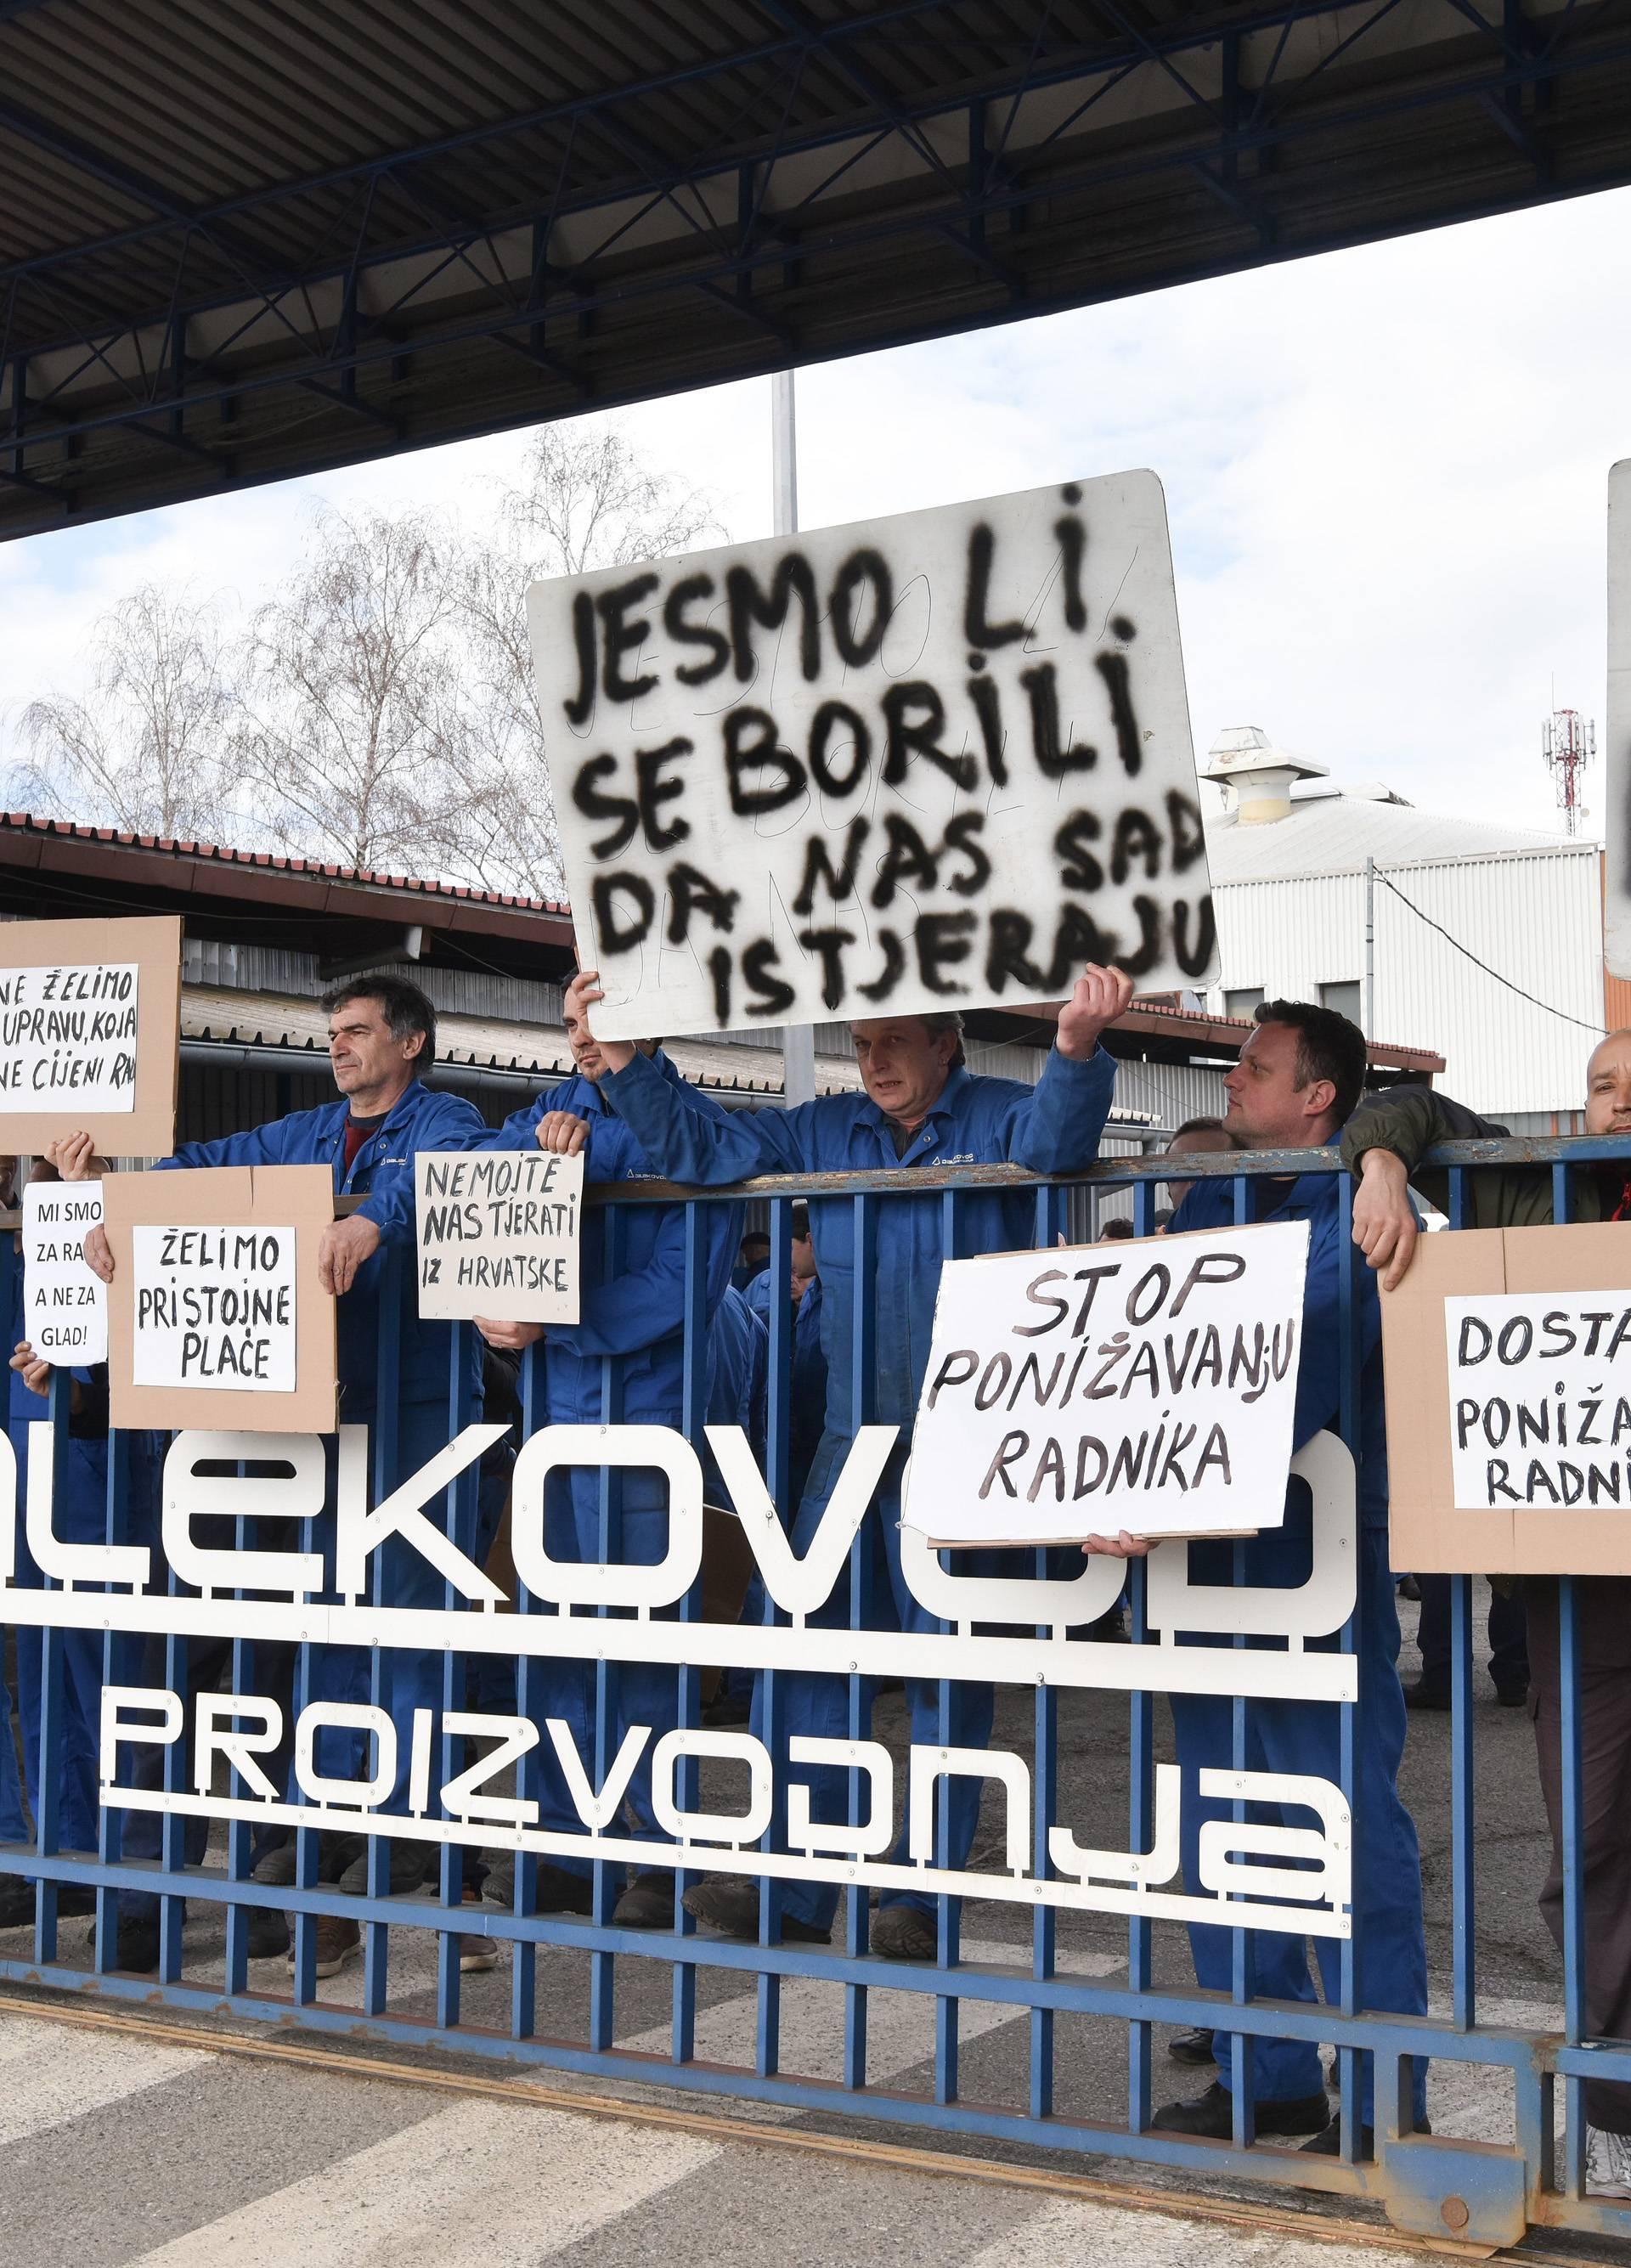 Štrajk u Dalekovodu: Uprava bi mogla ponuditi bolji ugovor...